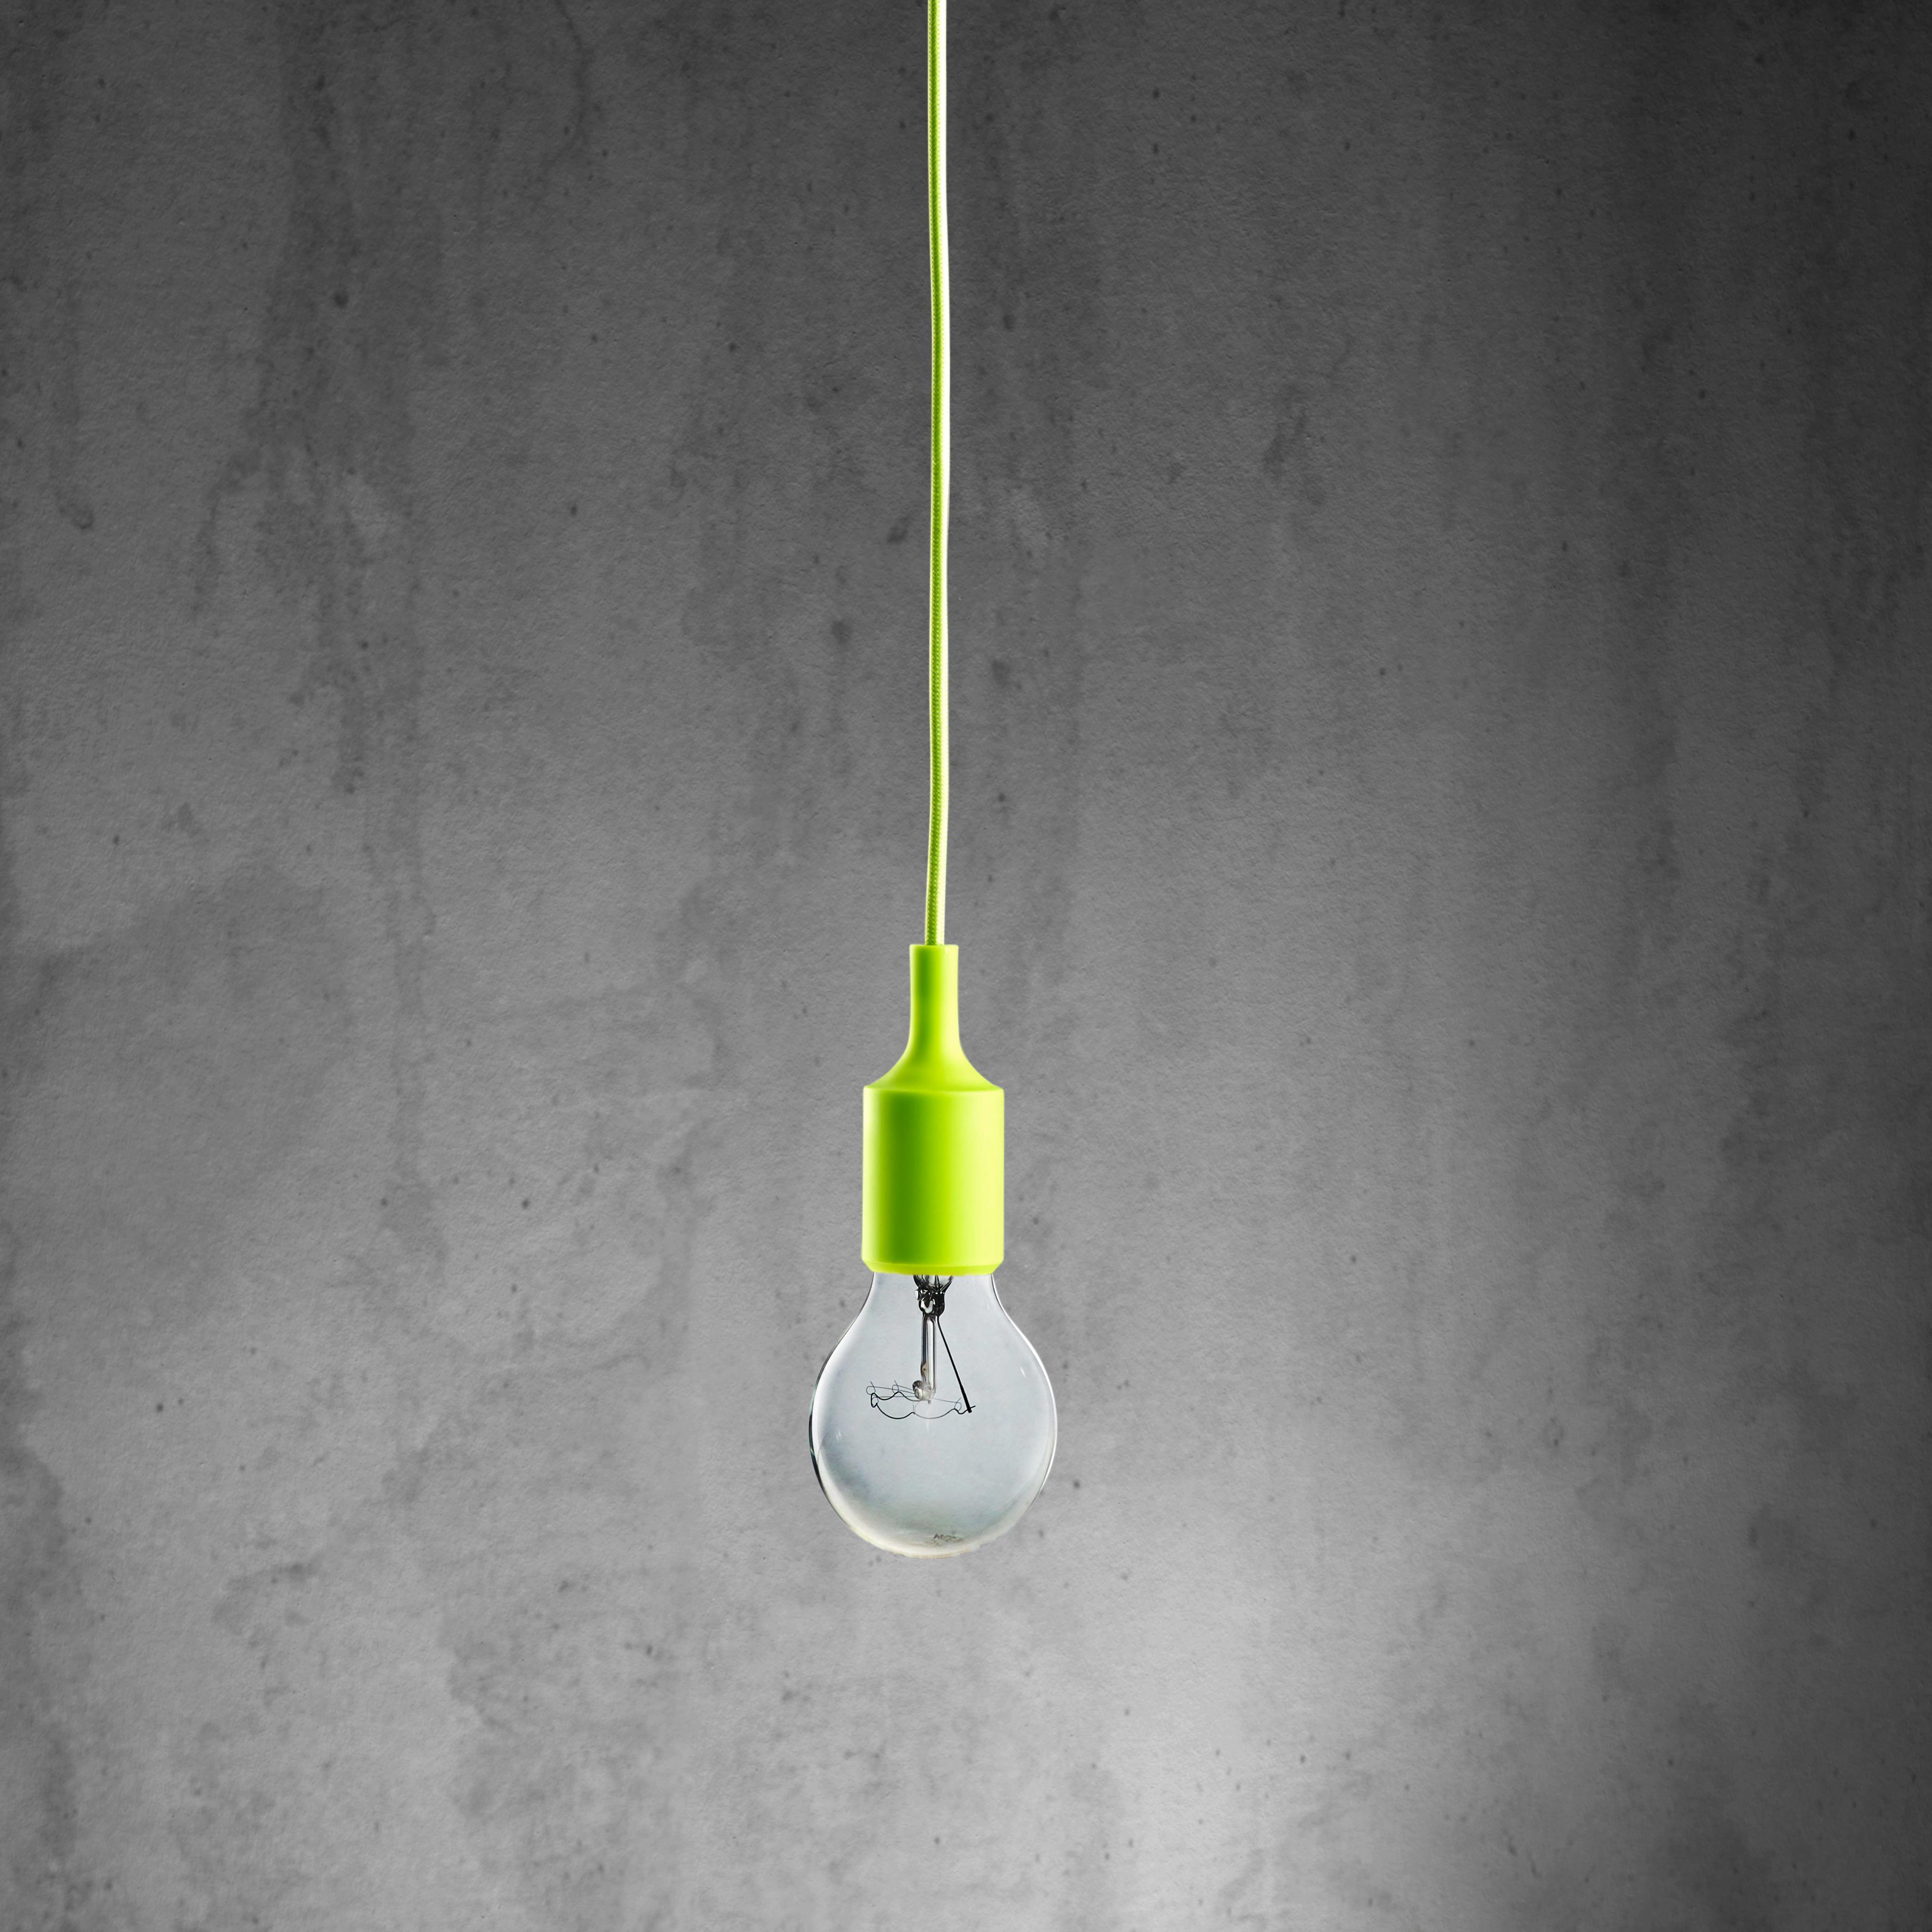 Hängeleuchte abby - Grün, MODERN, Kunststoff (9/92cm) - MÖMAX modern living